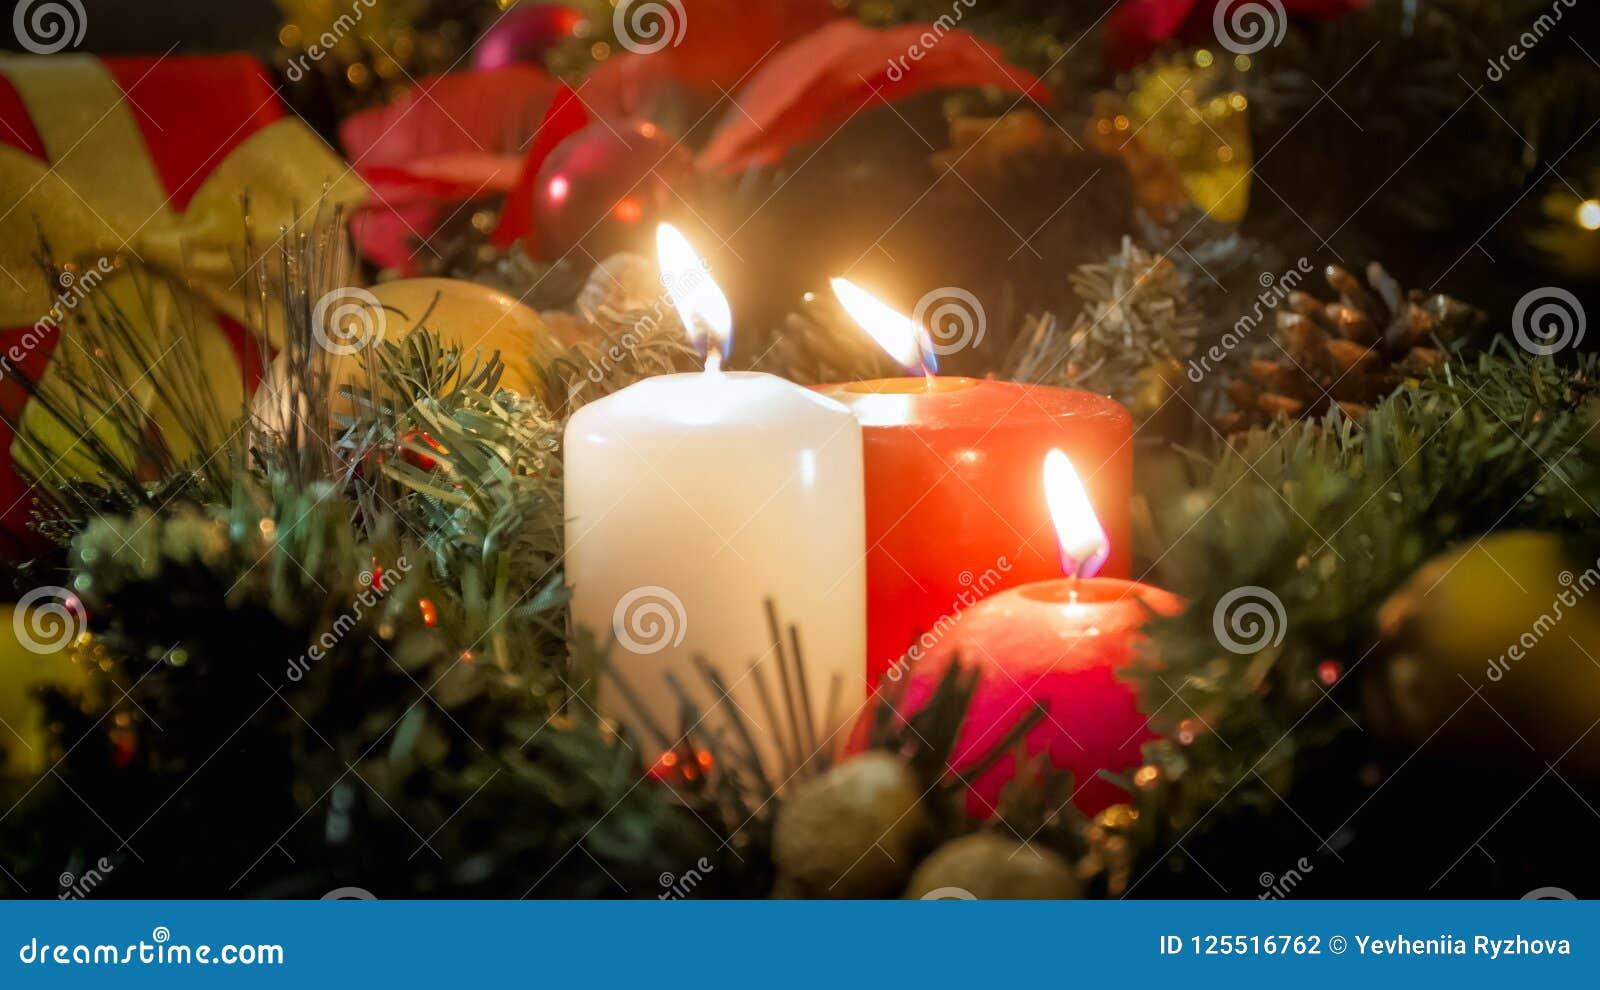 Beautiful Christmas.Closeup Image Of Three Burning Candles And Beautiful